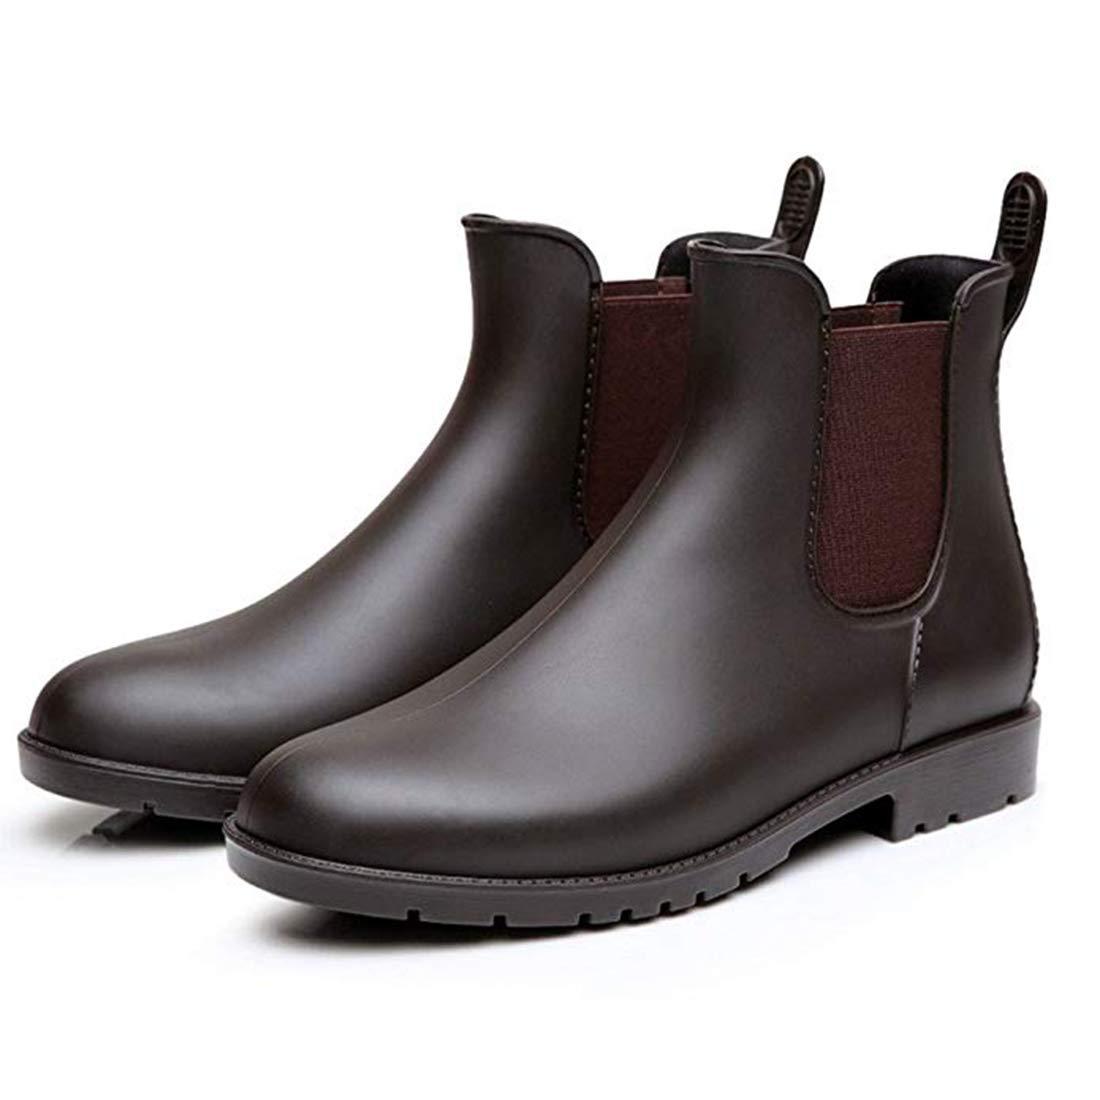 Buganda Women's Short Rain Boots - Waterproof Non Slip Ankle Rain Shoes Elastic Chelsea Booties YX-1